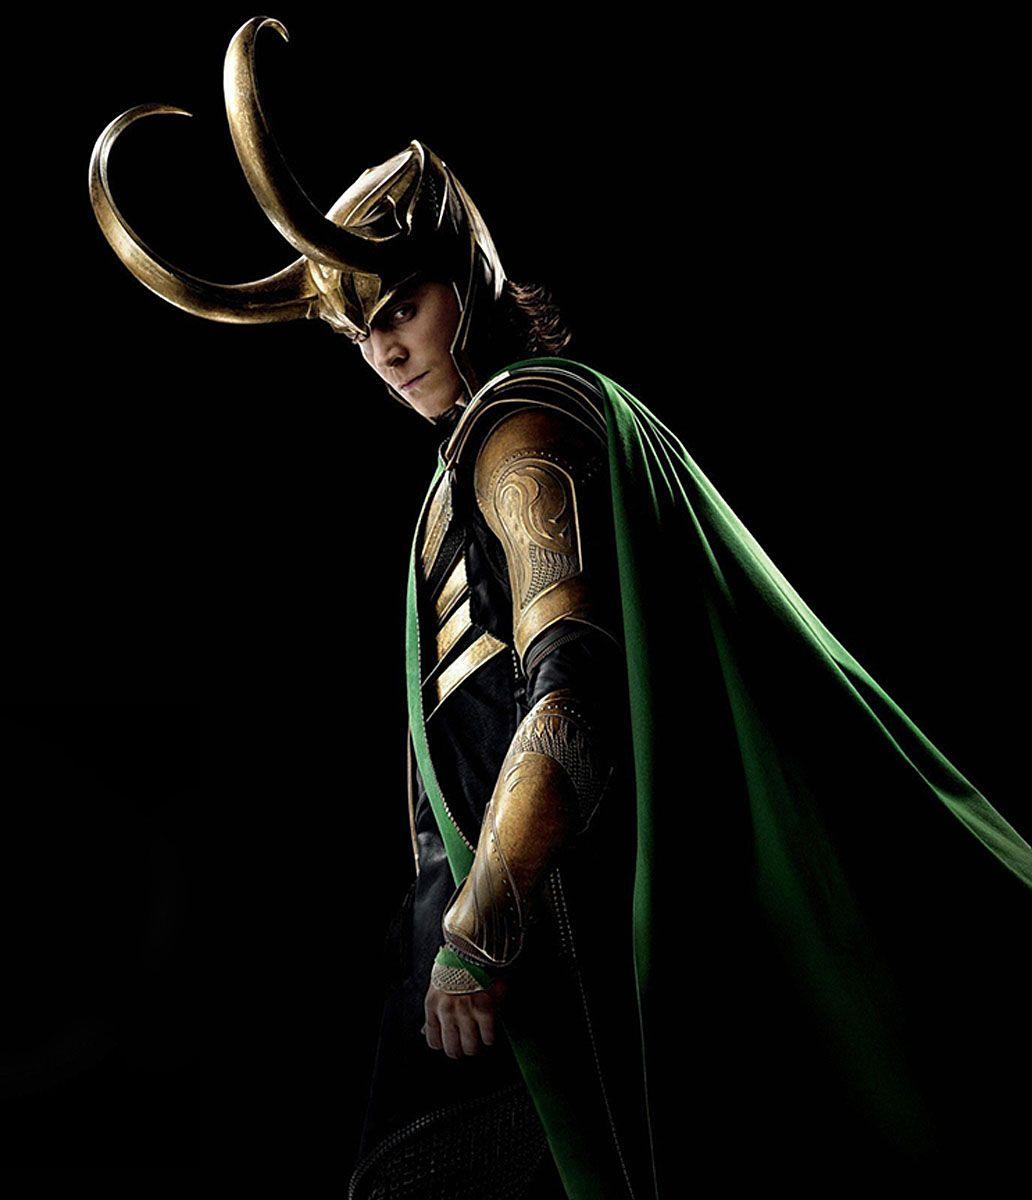 Good Wallpaper Marvel Loki - 5dc362fb54f68a2502617bf59190a8bc  Picture_504279.jpg